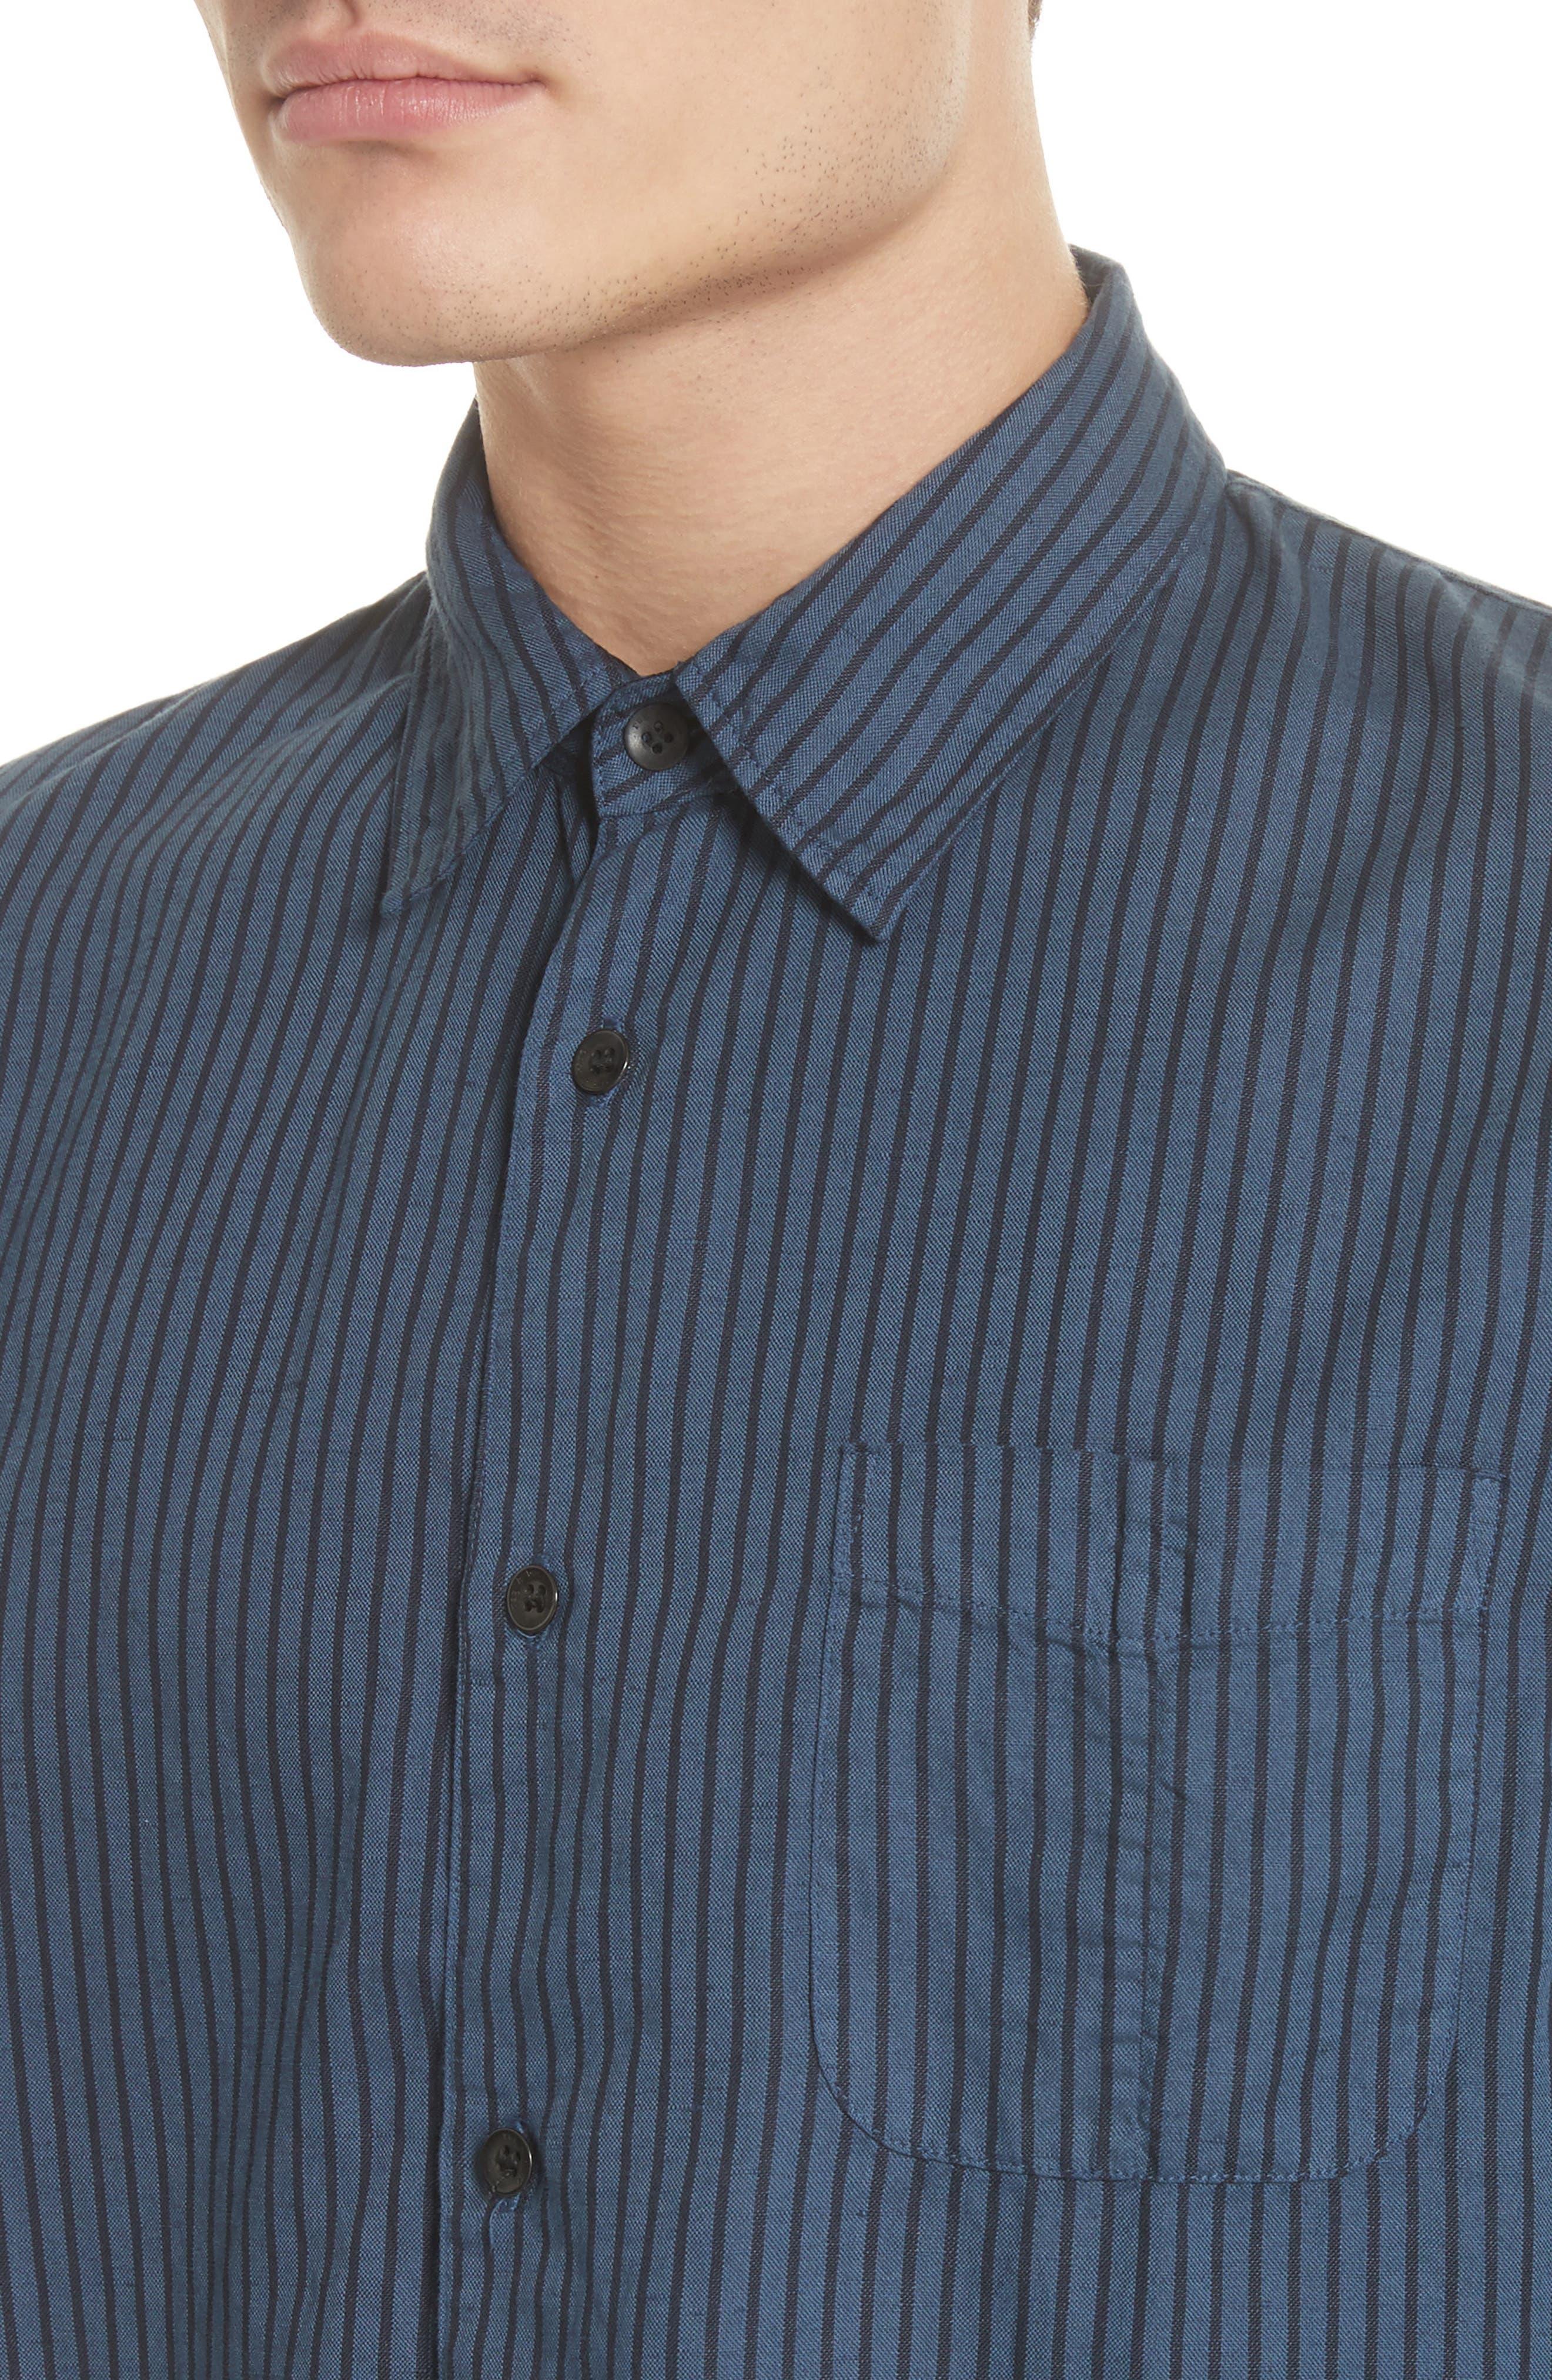 Beach Fit 3 Stripe Shirt,                             Alternate thumbnail 4, color,